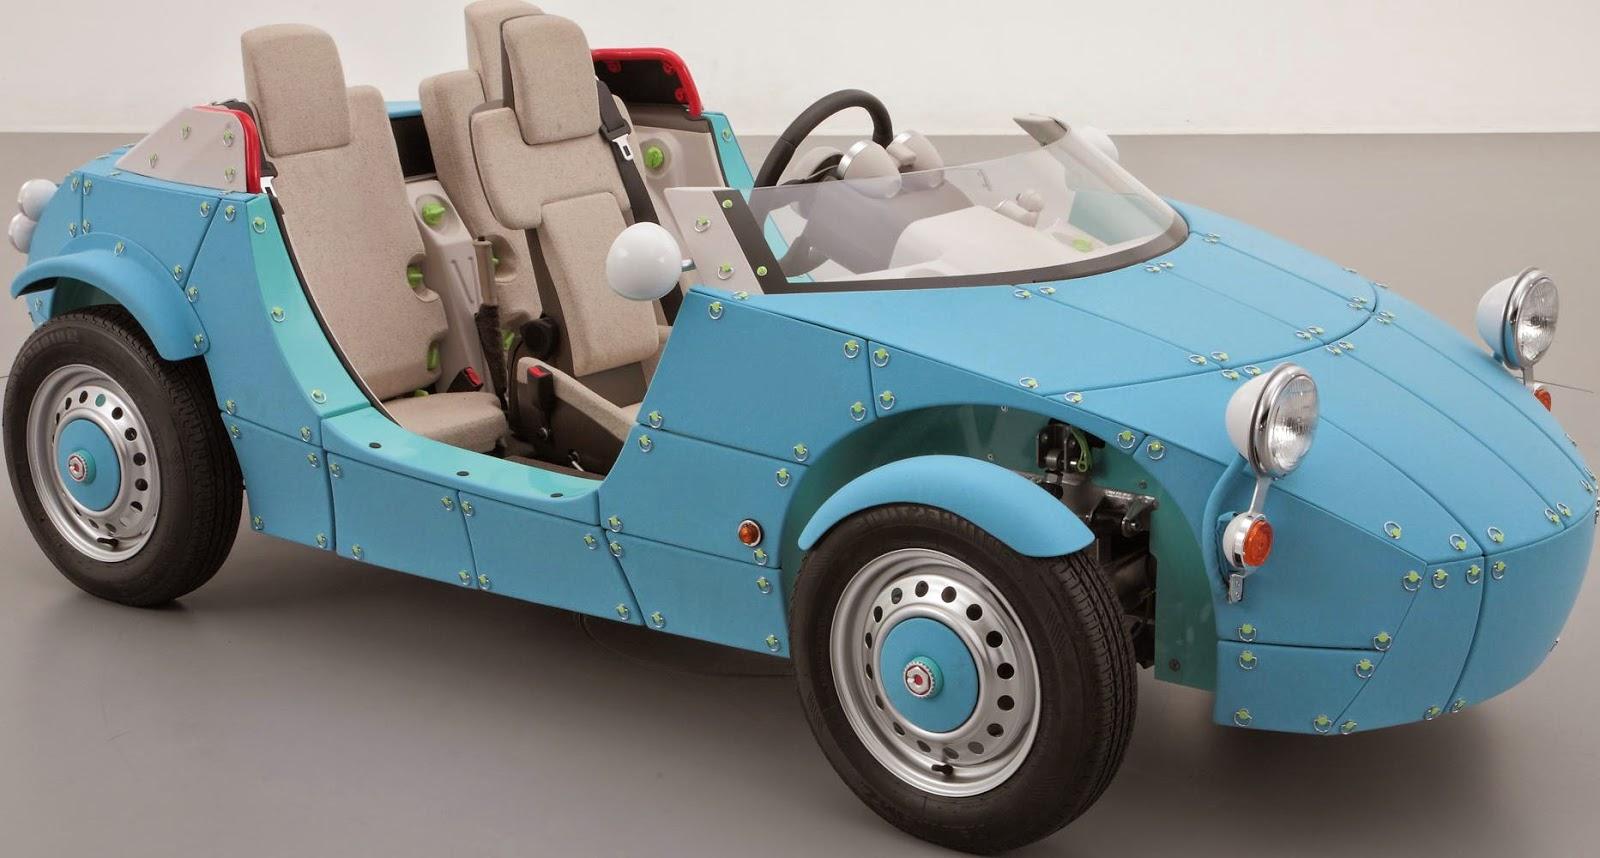 يوتيوب سيارات اطفال، سيارات صغيرة, toyota, cars for kids, small cars